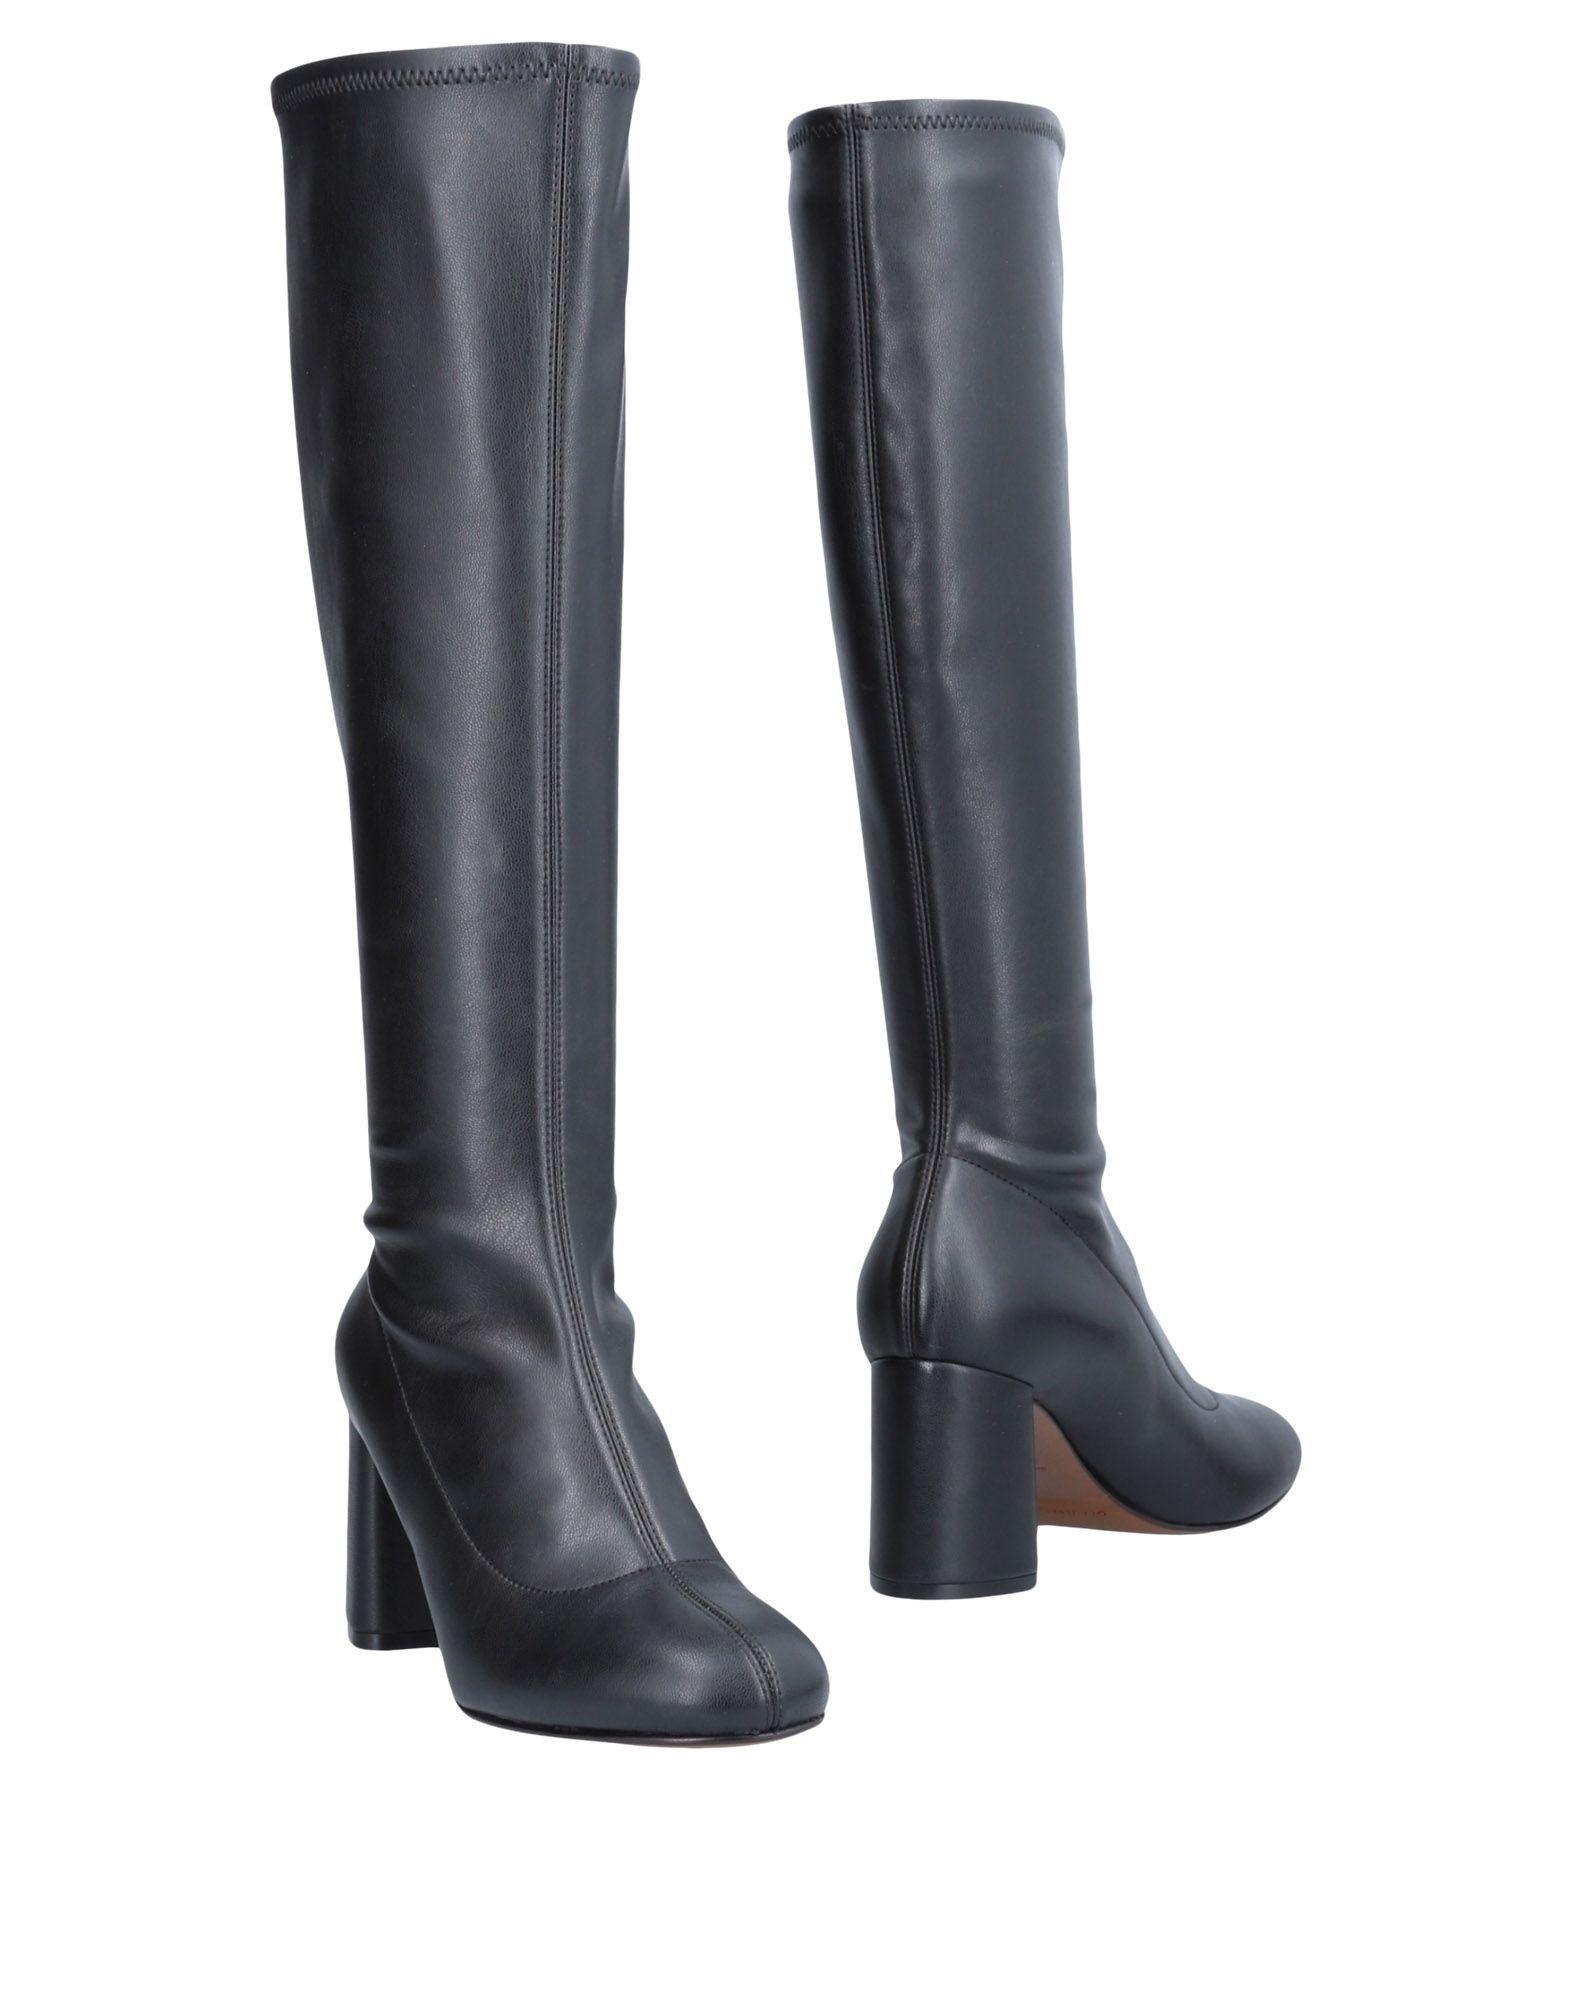 L' Autre Chose Stiefel Damen  11487800DFGut aussehende strapazierfähige Schuhe